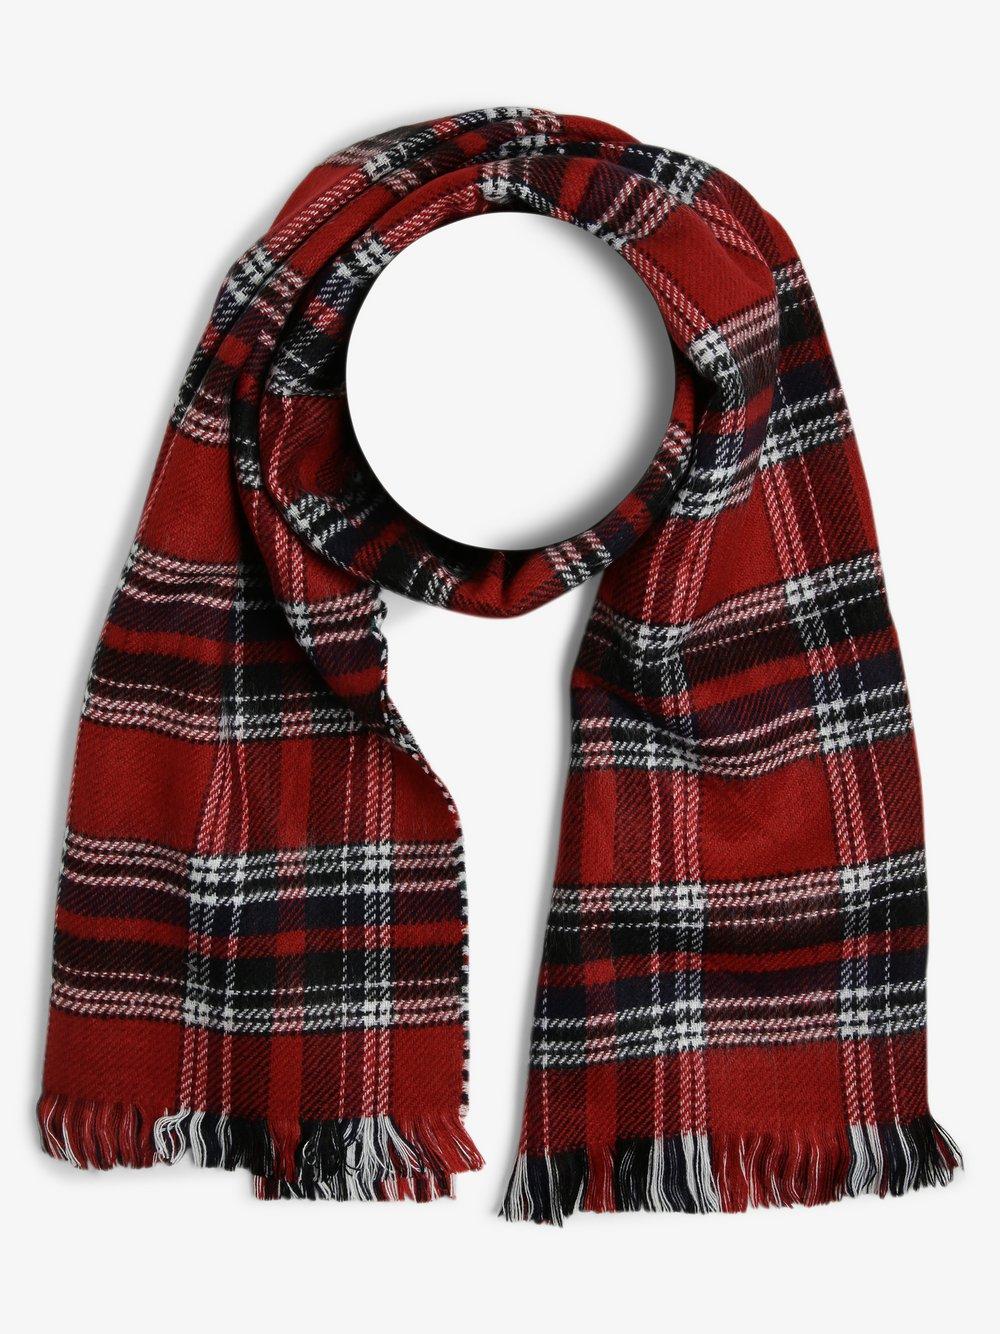 Finshley & Harding London – Szalik męski – Oxford, czerwony Van Graaf 487095-0001